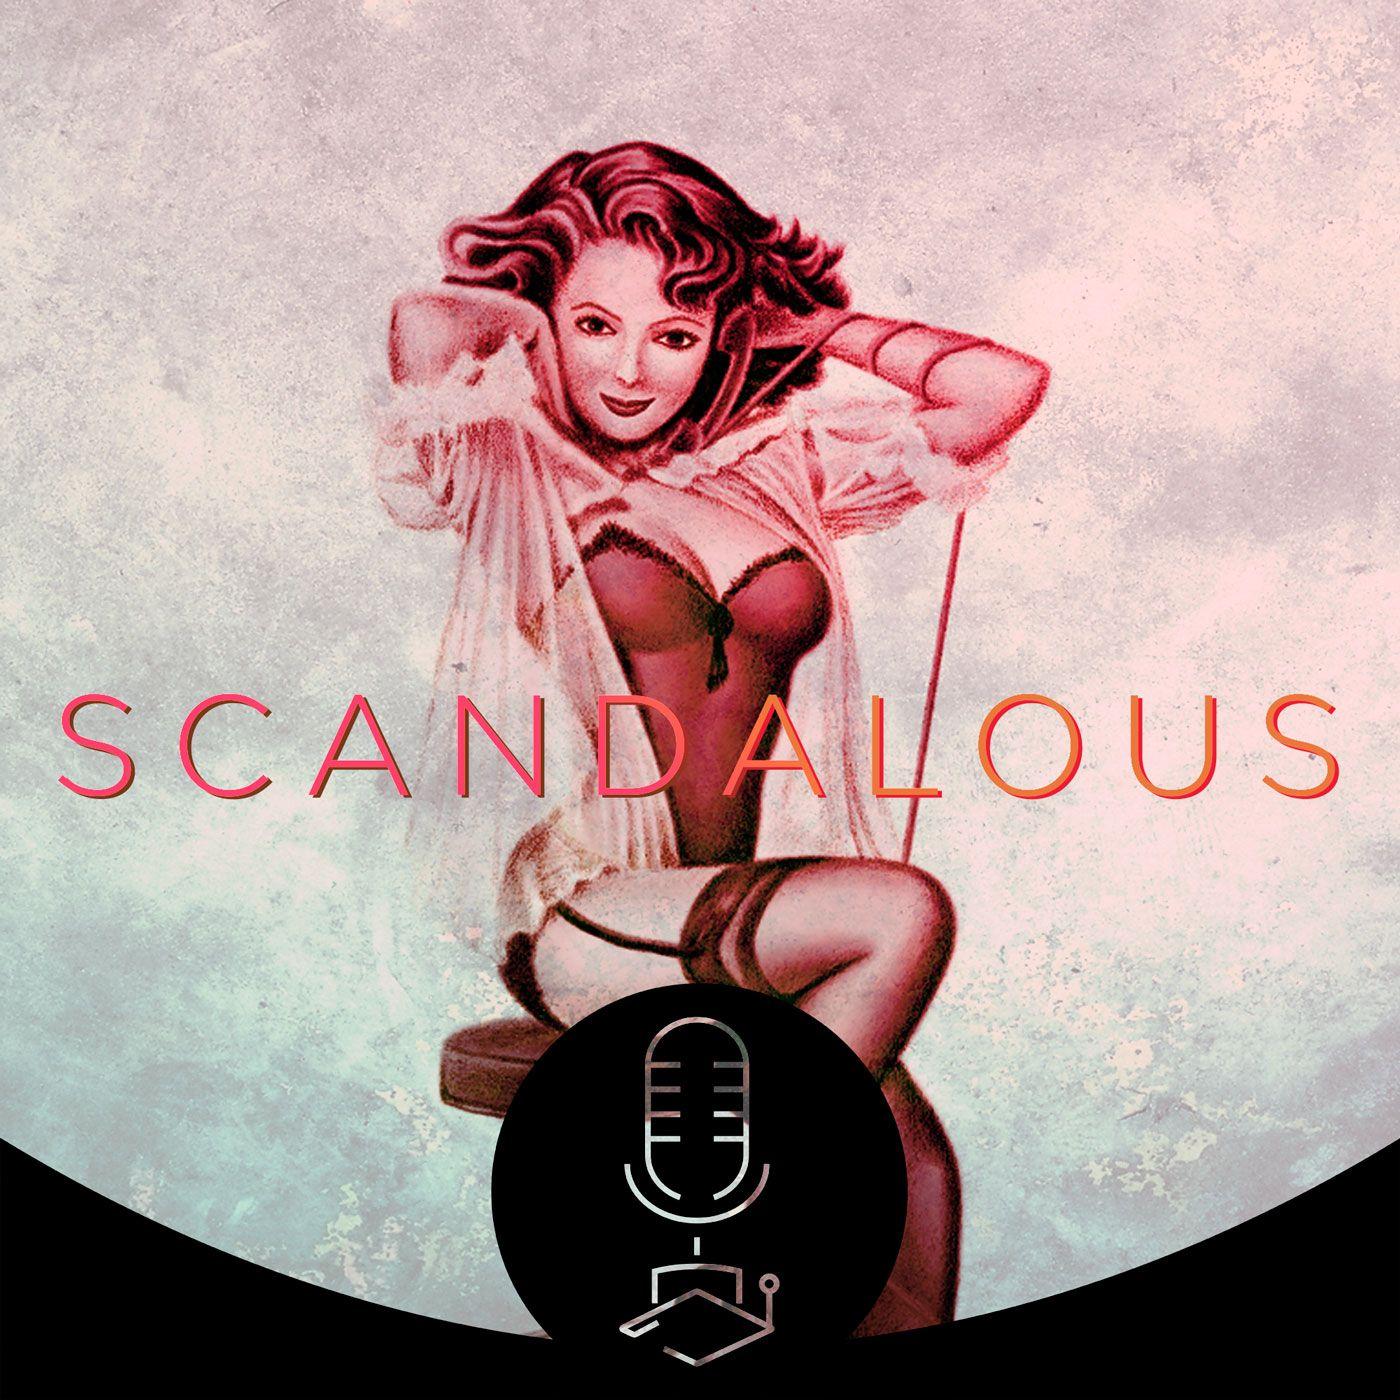 Scandalous #031 – We wish you a squirting Christmas!